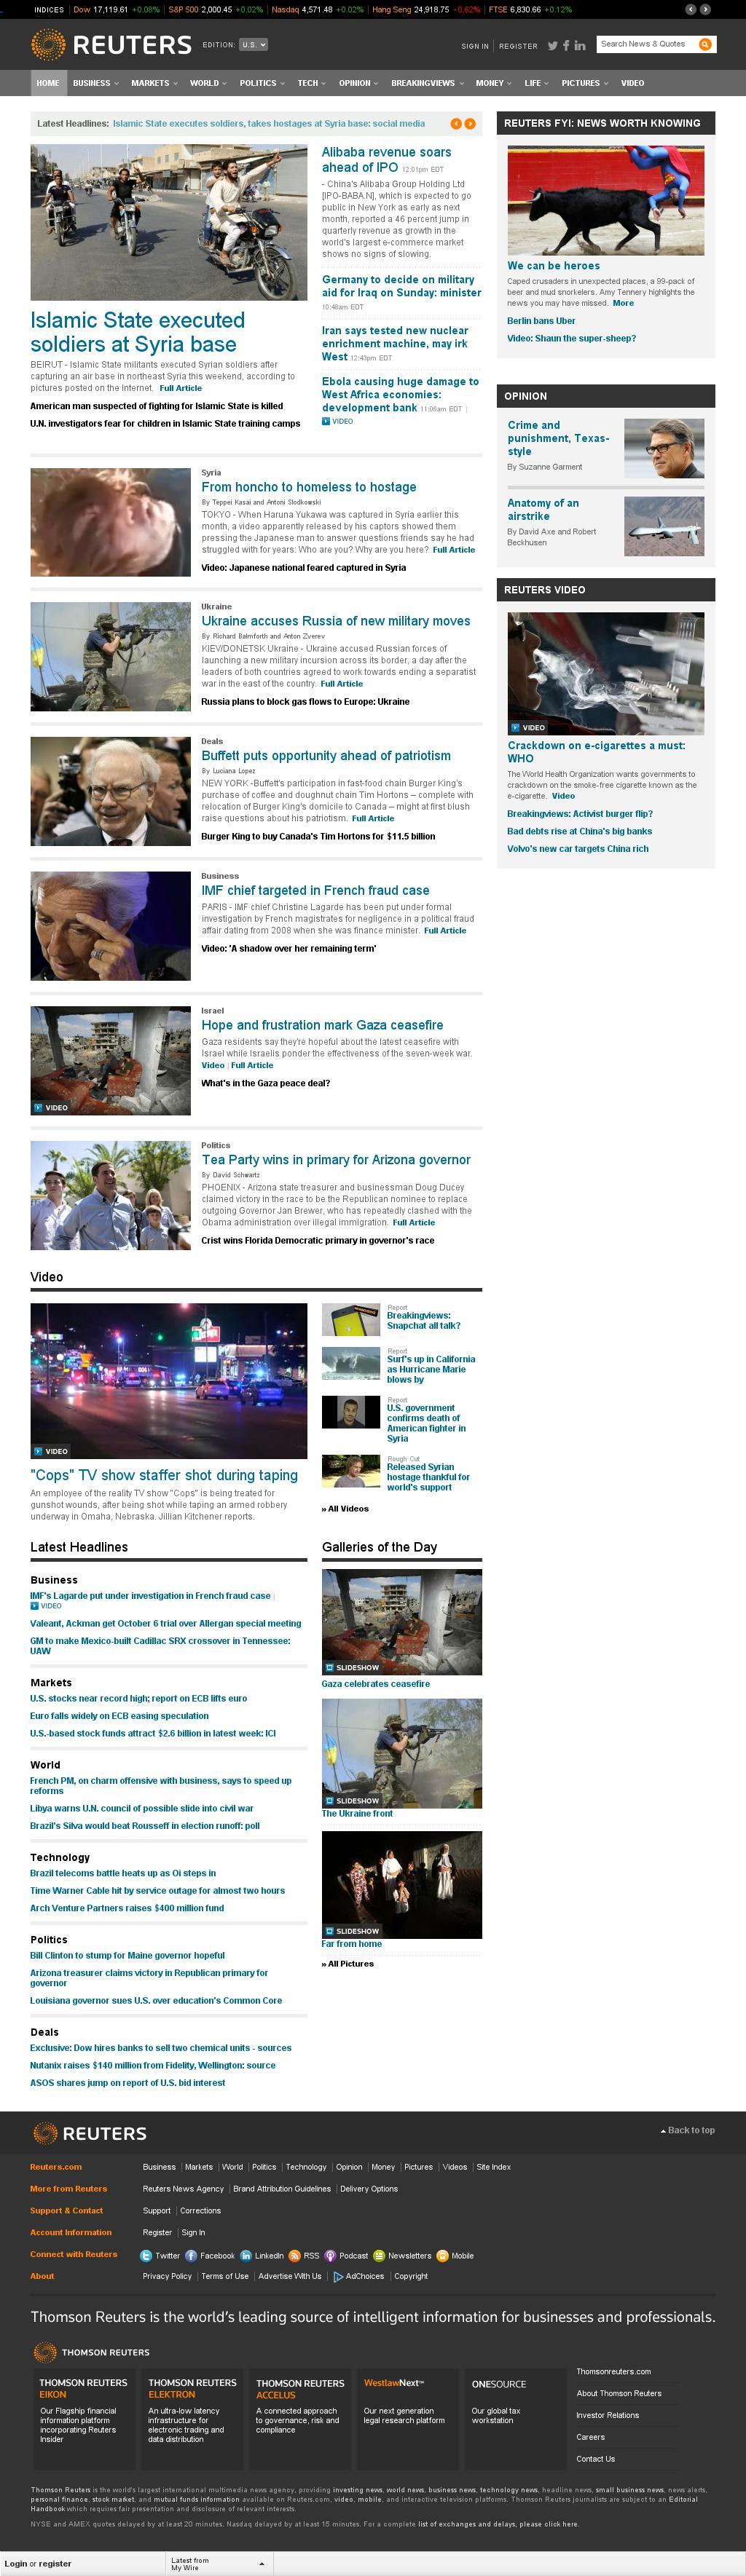 Reuters at Wednesday Aug. 27, 2014, 5:14 p.m. UTC